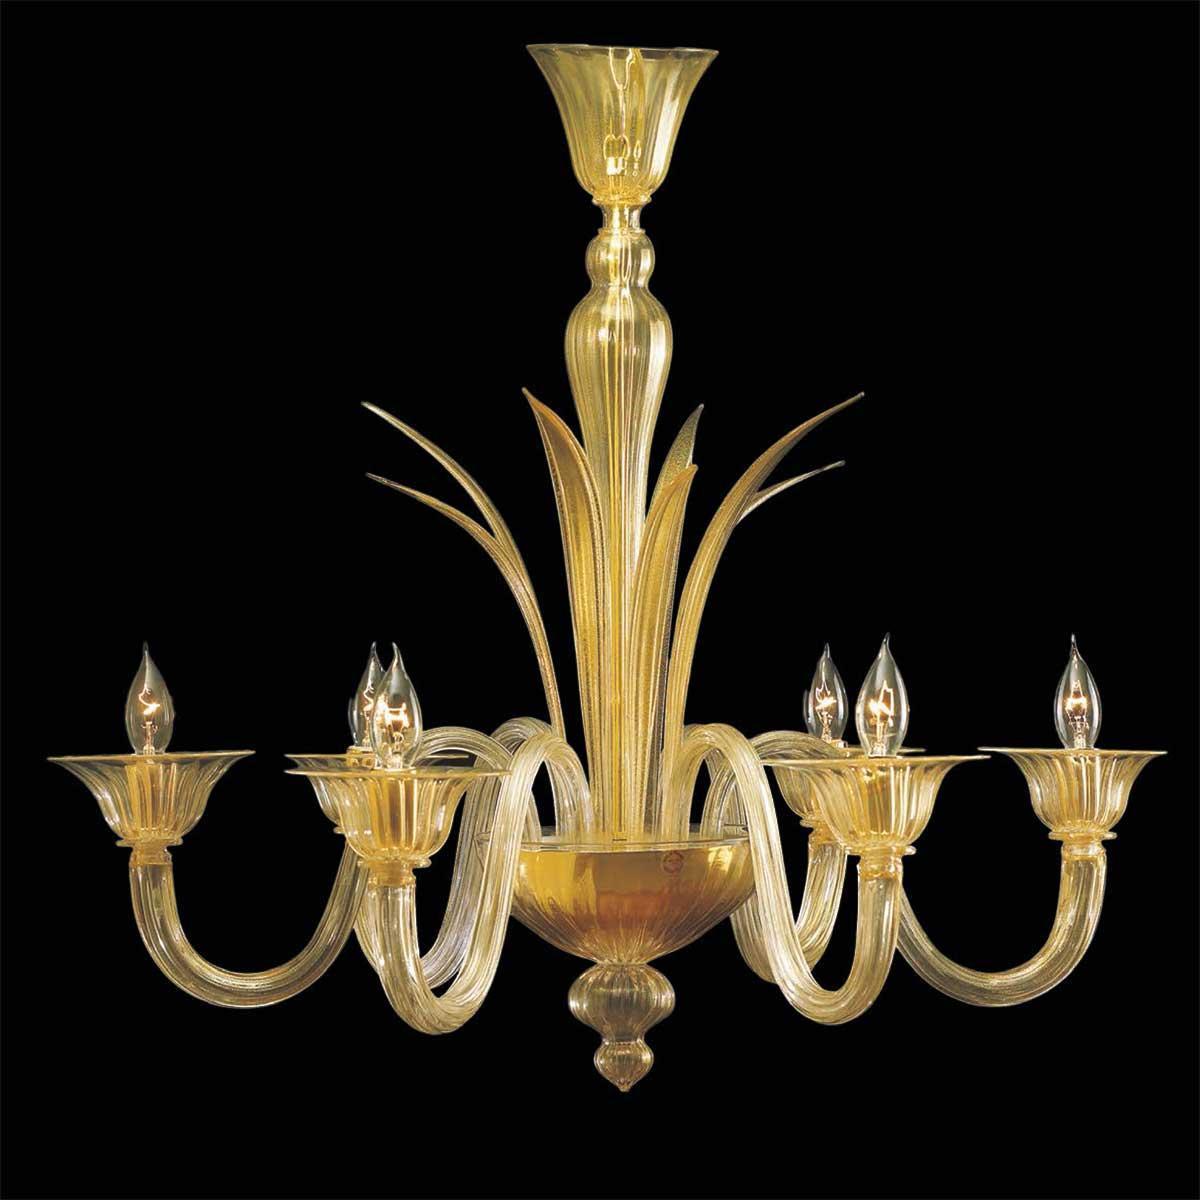 """Aladino"" Murano glas Kronleuchter - 6 flammig - gold"